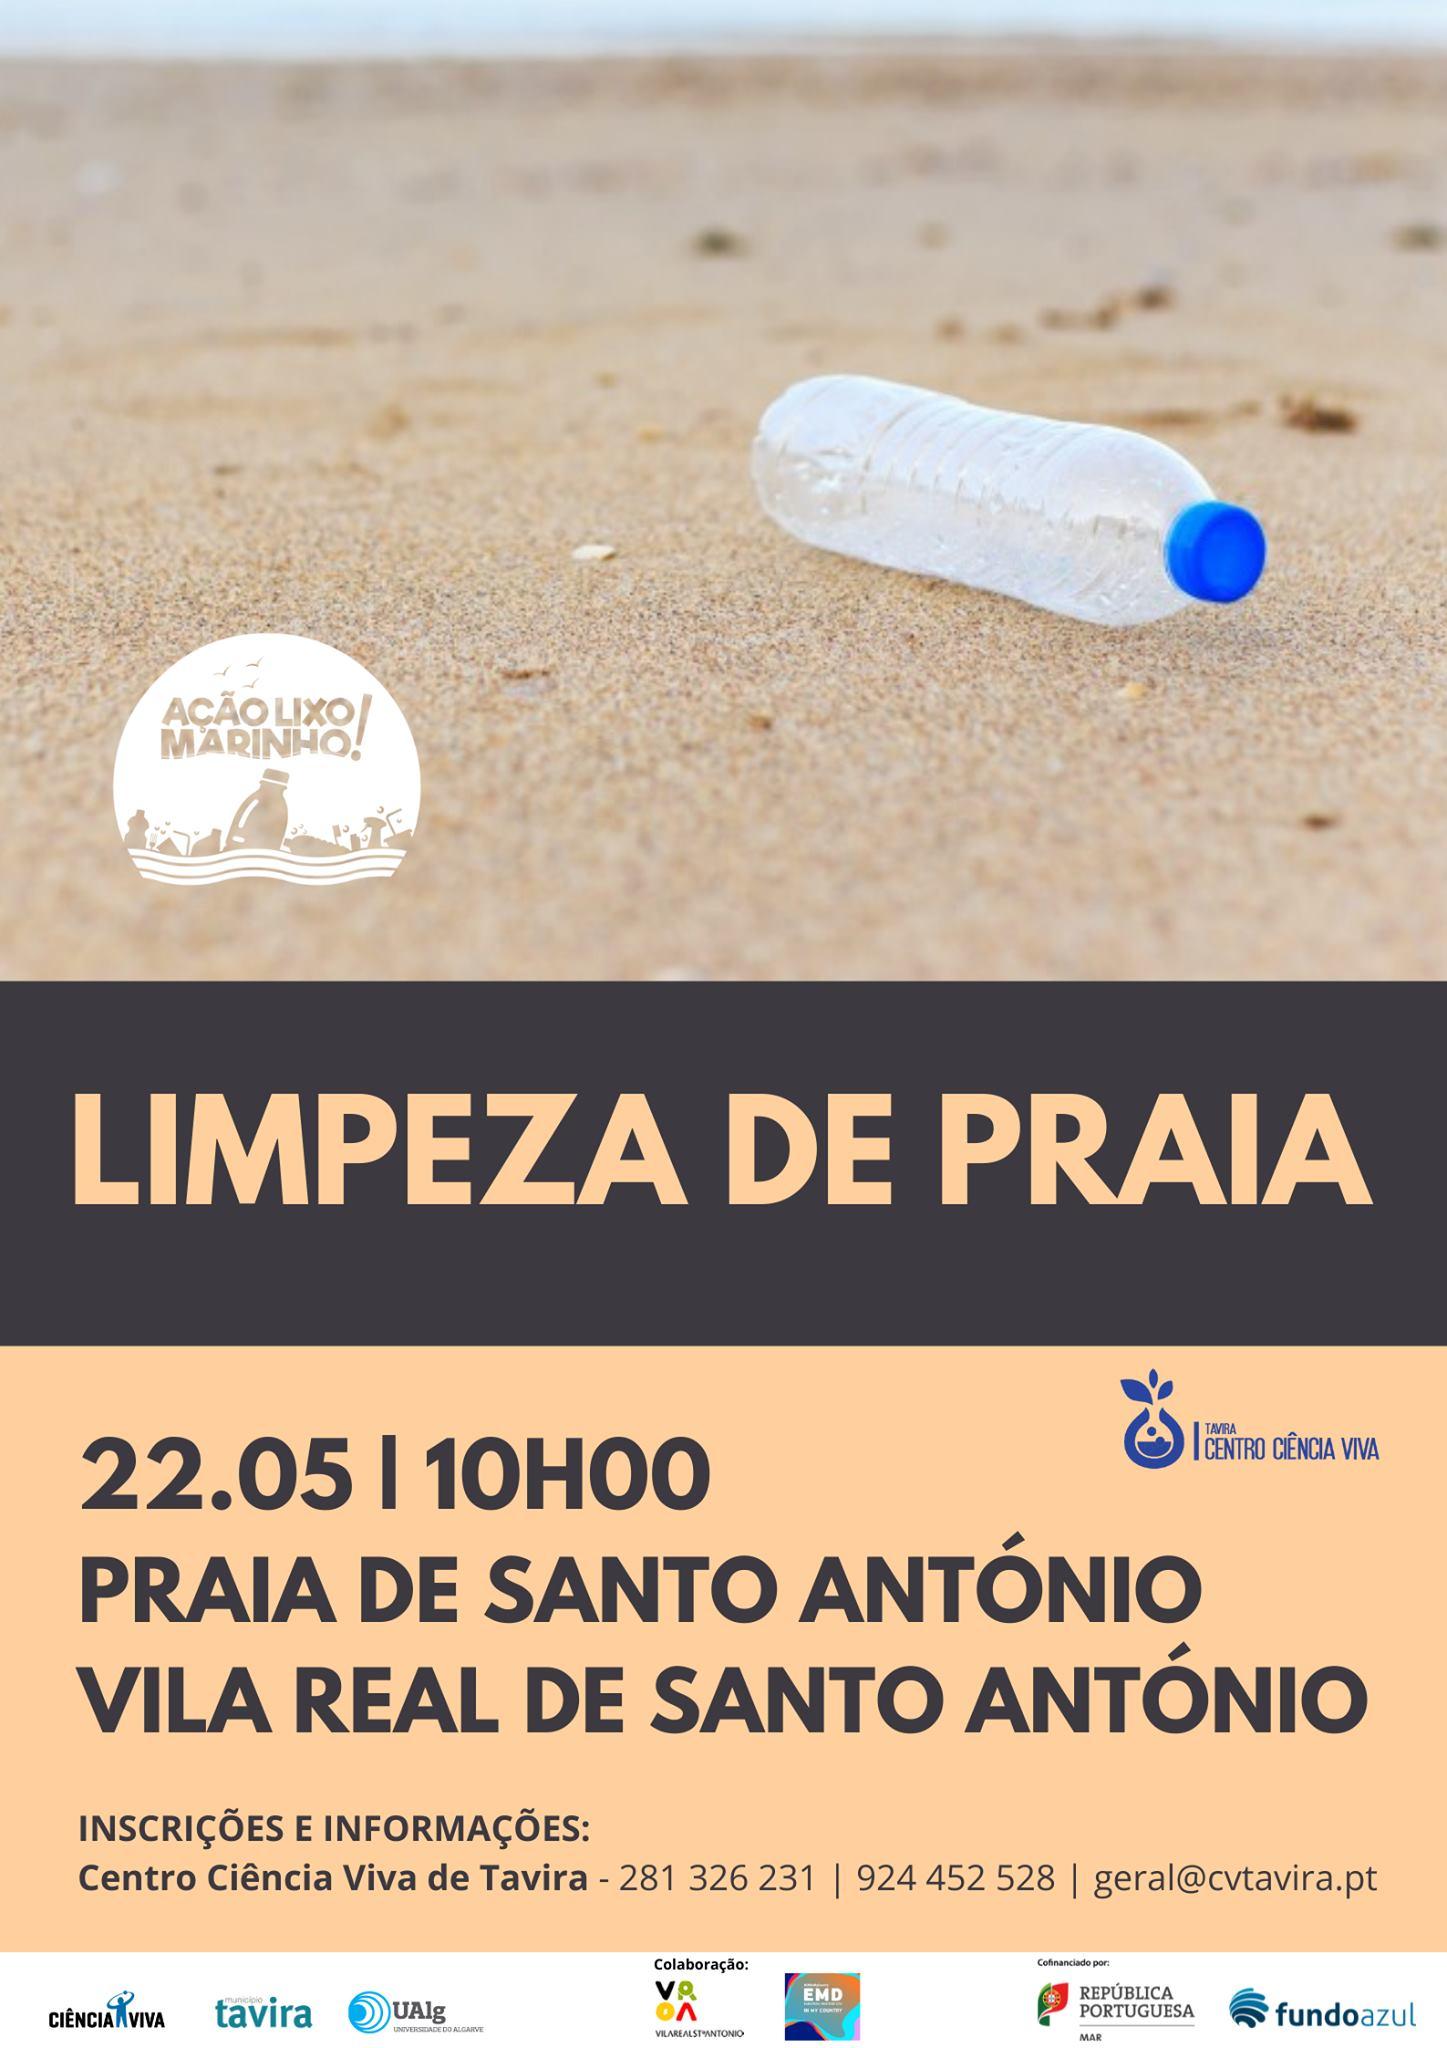 LIMPEZA DE PRAIA - VRSA